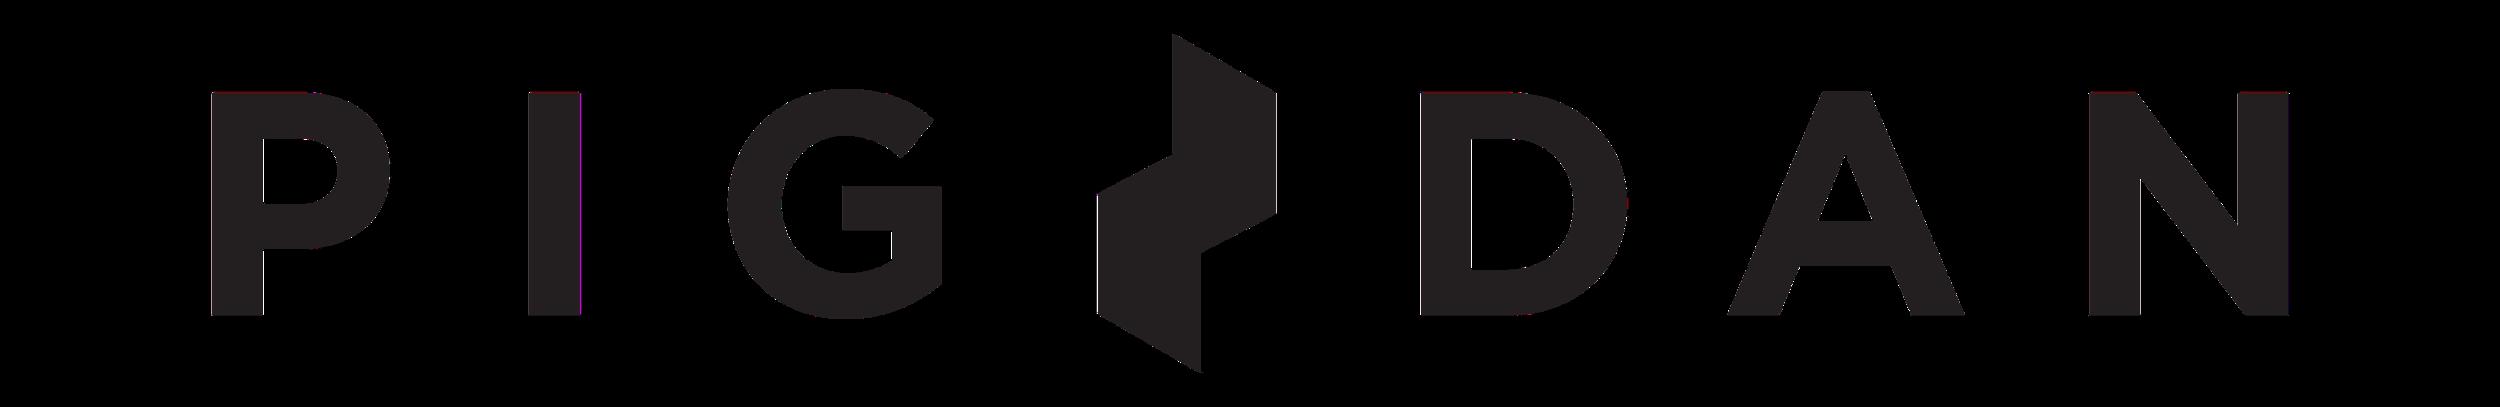 PD-Text-Logo-Black-Transparent.png